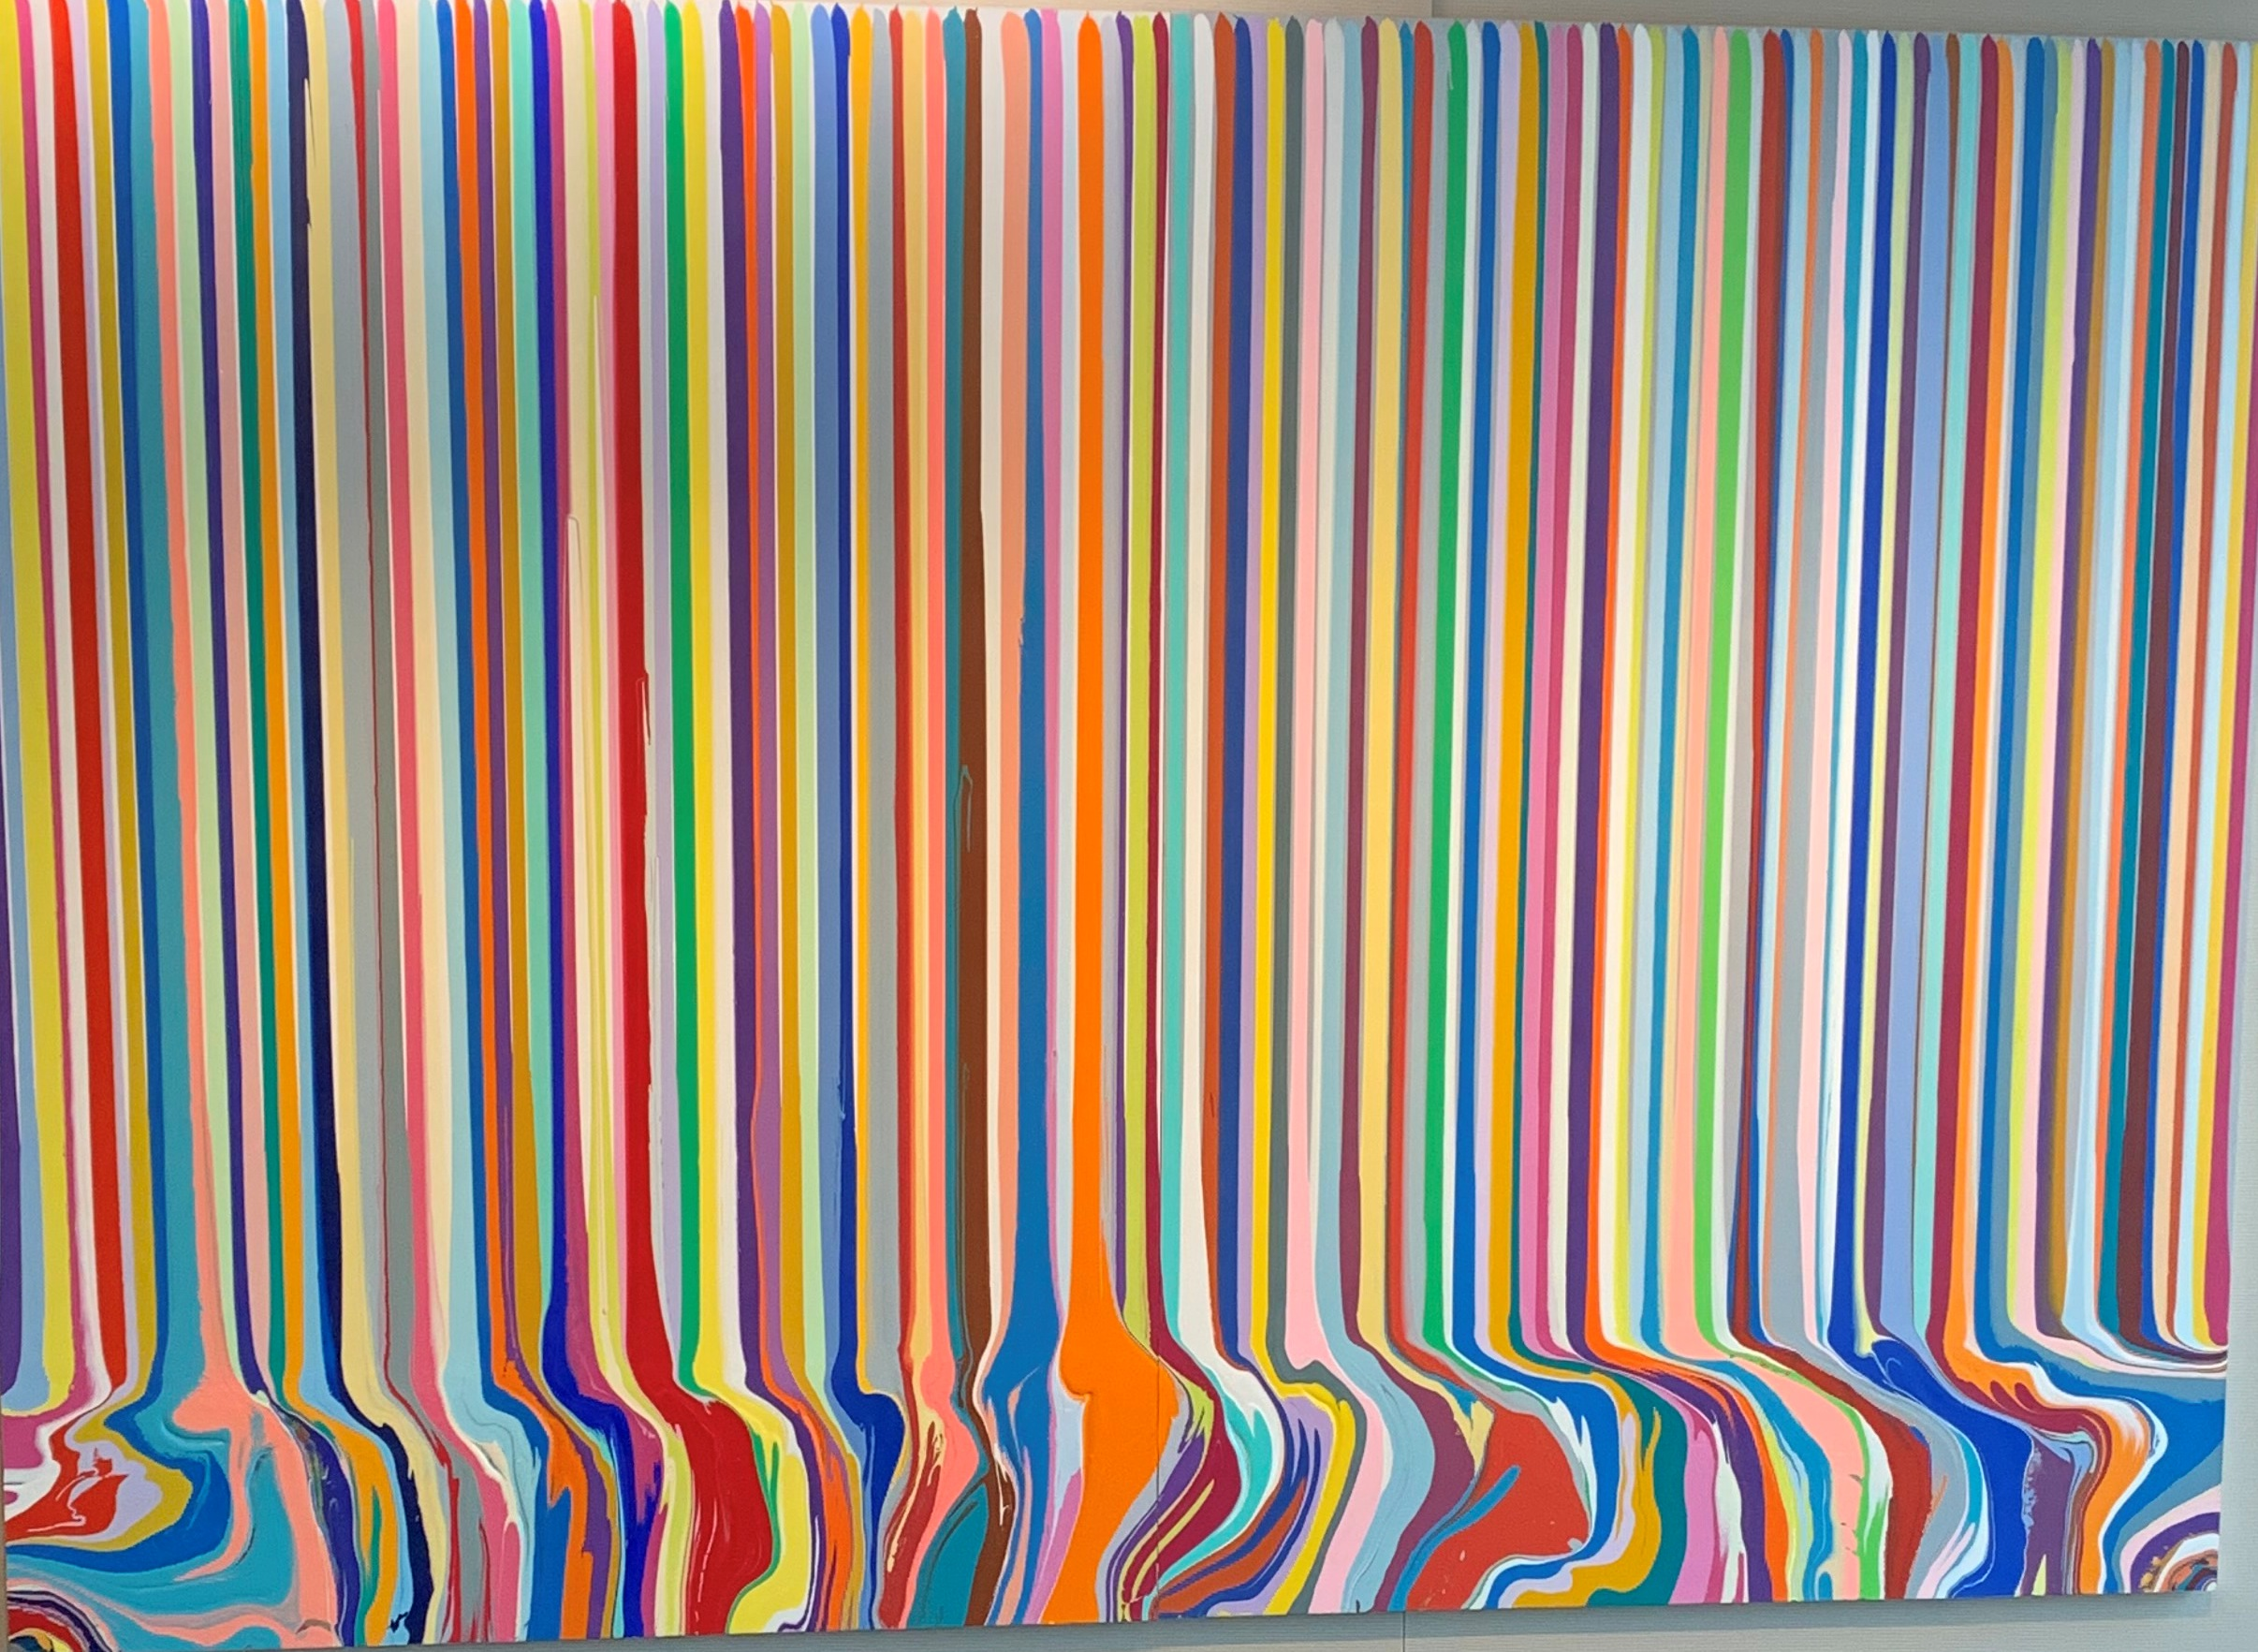 Puddlepainting Chromascopic 2 artwork by Ian Davenport - art listed for sale on Artplode